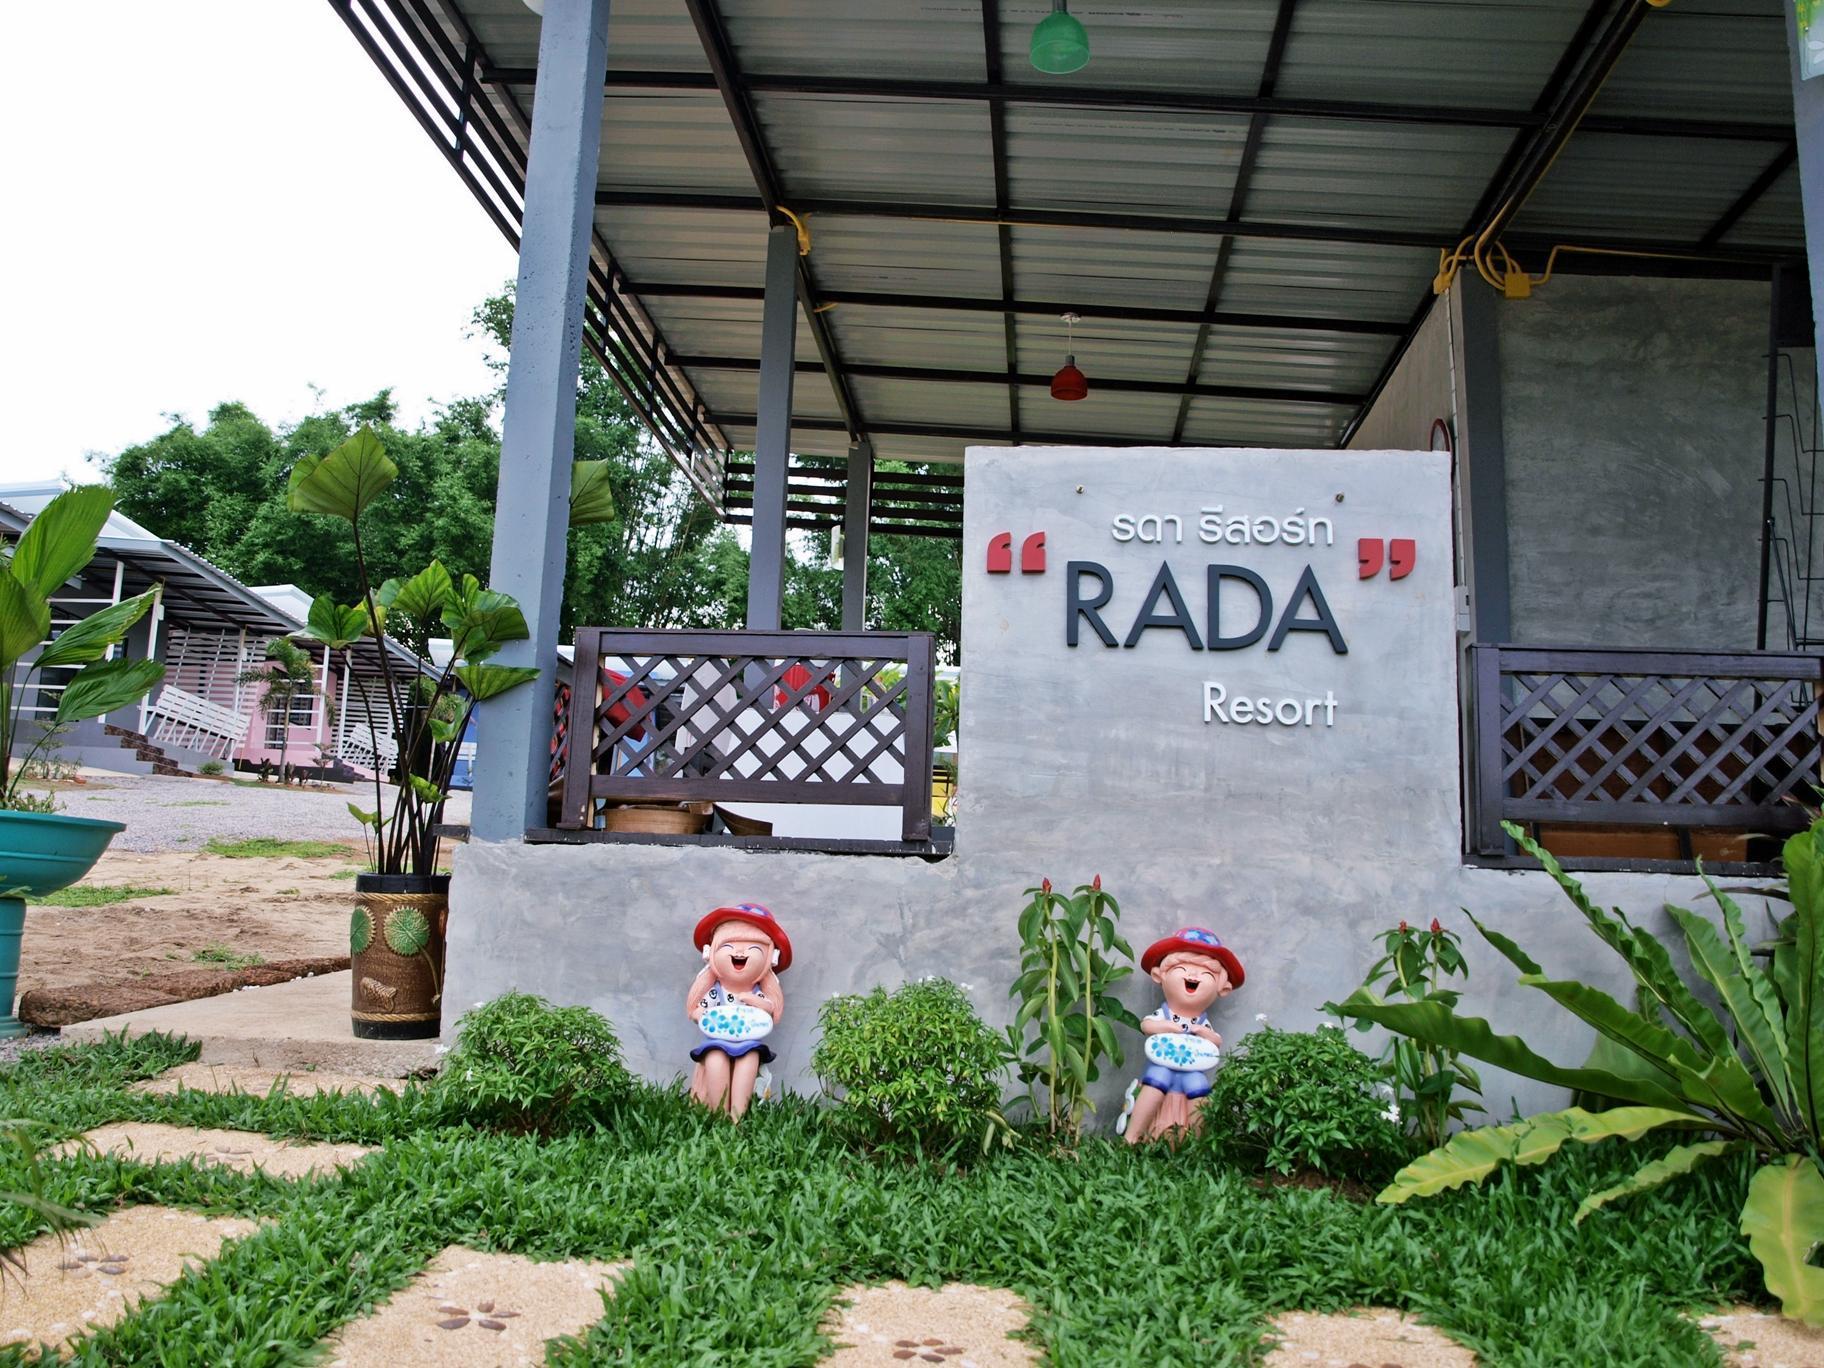 Rada Resort